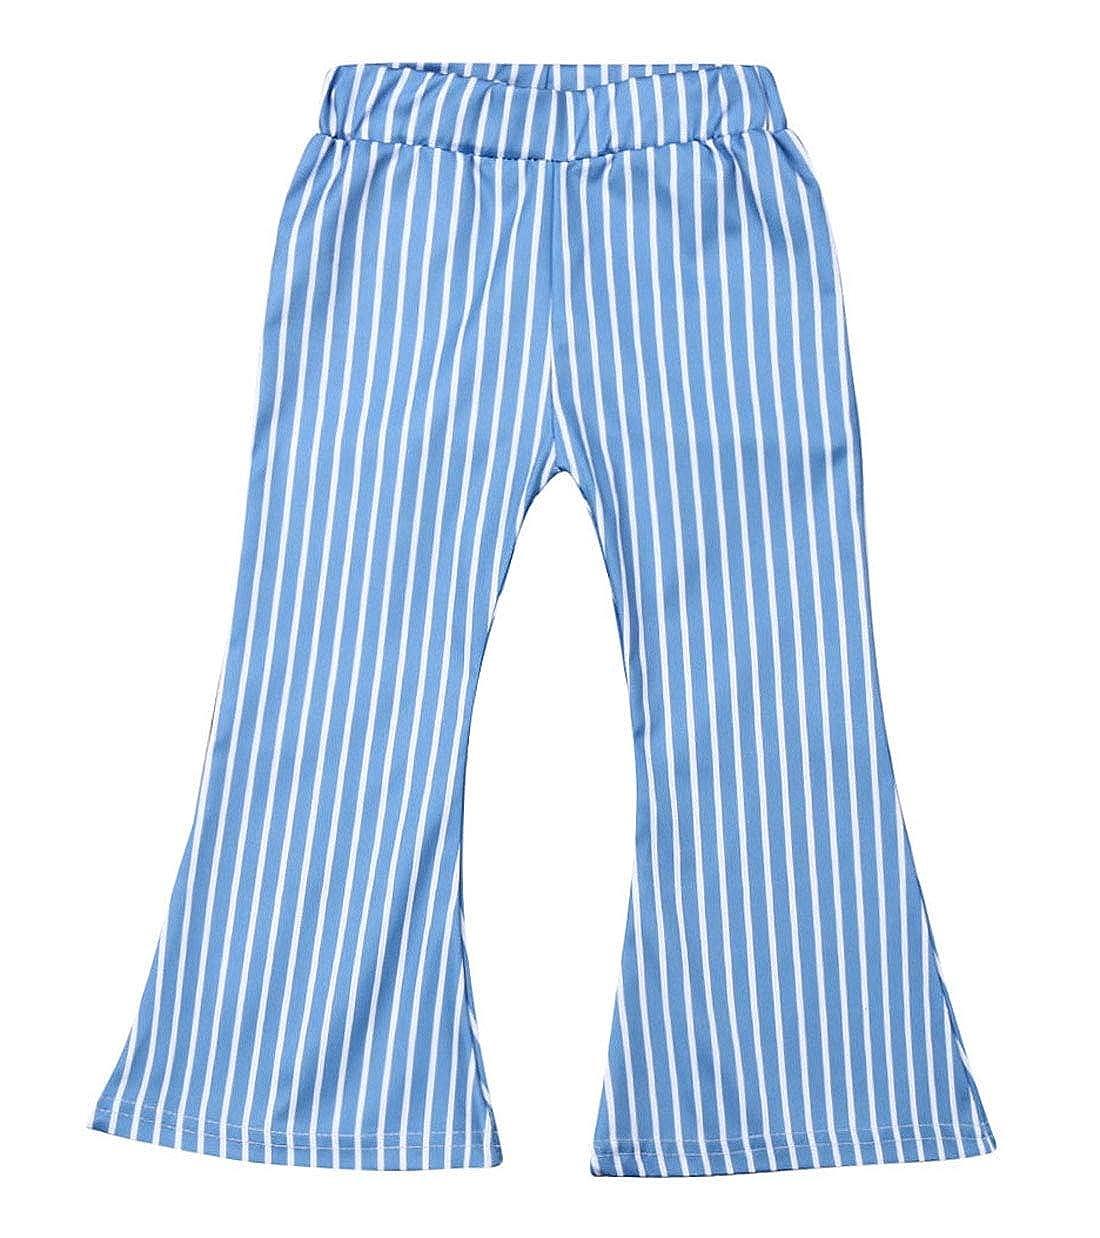 Sendewoner Toddler Baby Girls Pants Set Elastic Waist Striped Bell Bottom Trousers Fashion Long Pants Little Girls Clothes